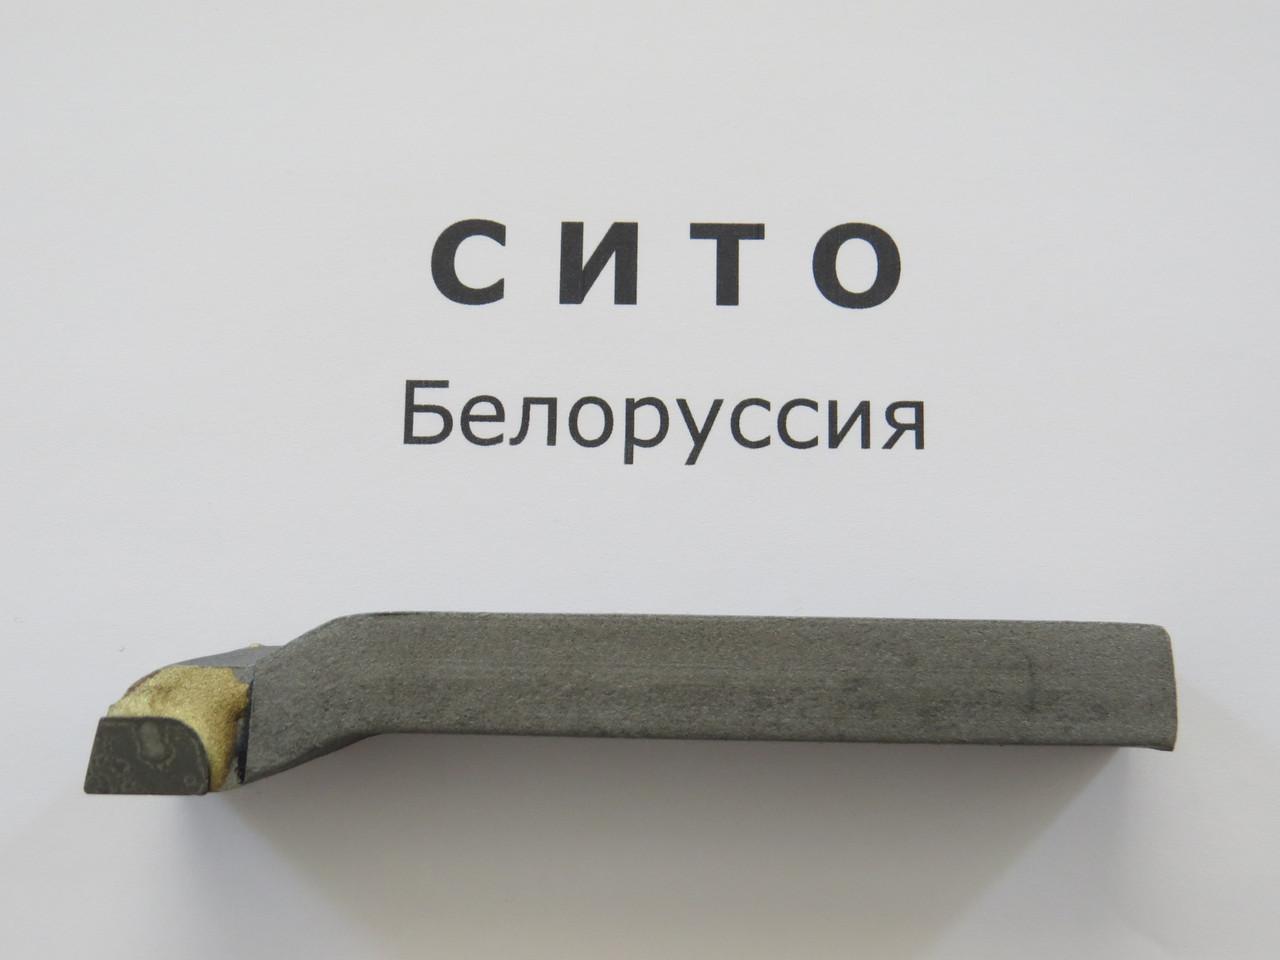 Резец проходной упорно изогнутый 40х25х200 (ВК8) СИТО Беларусь